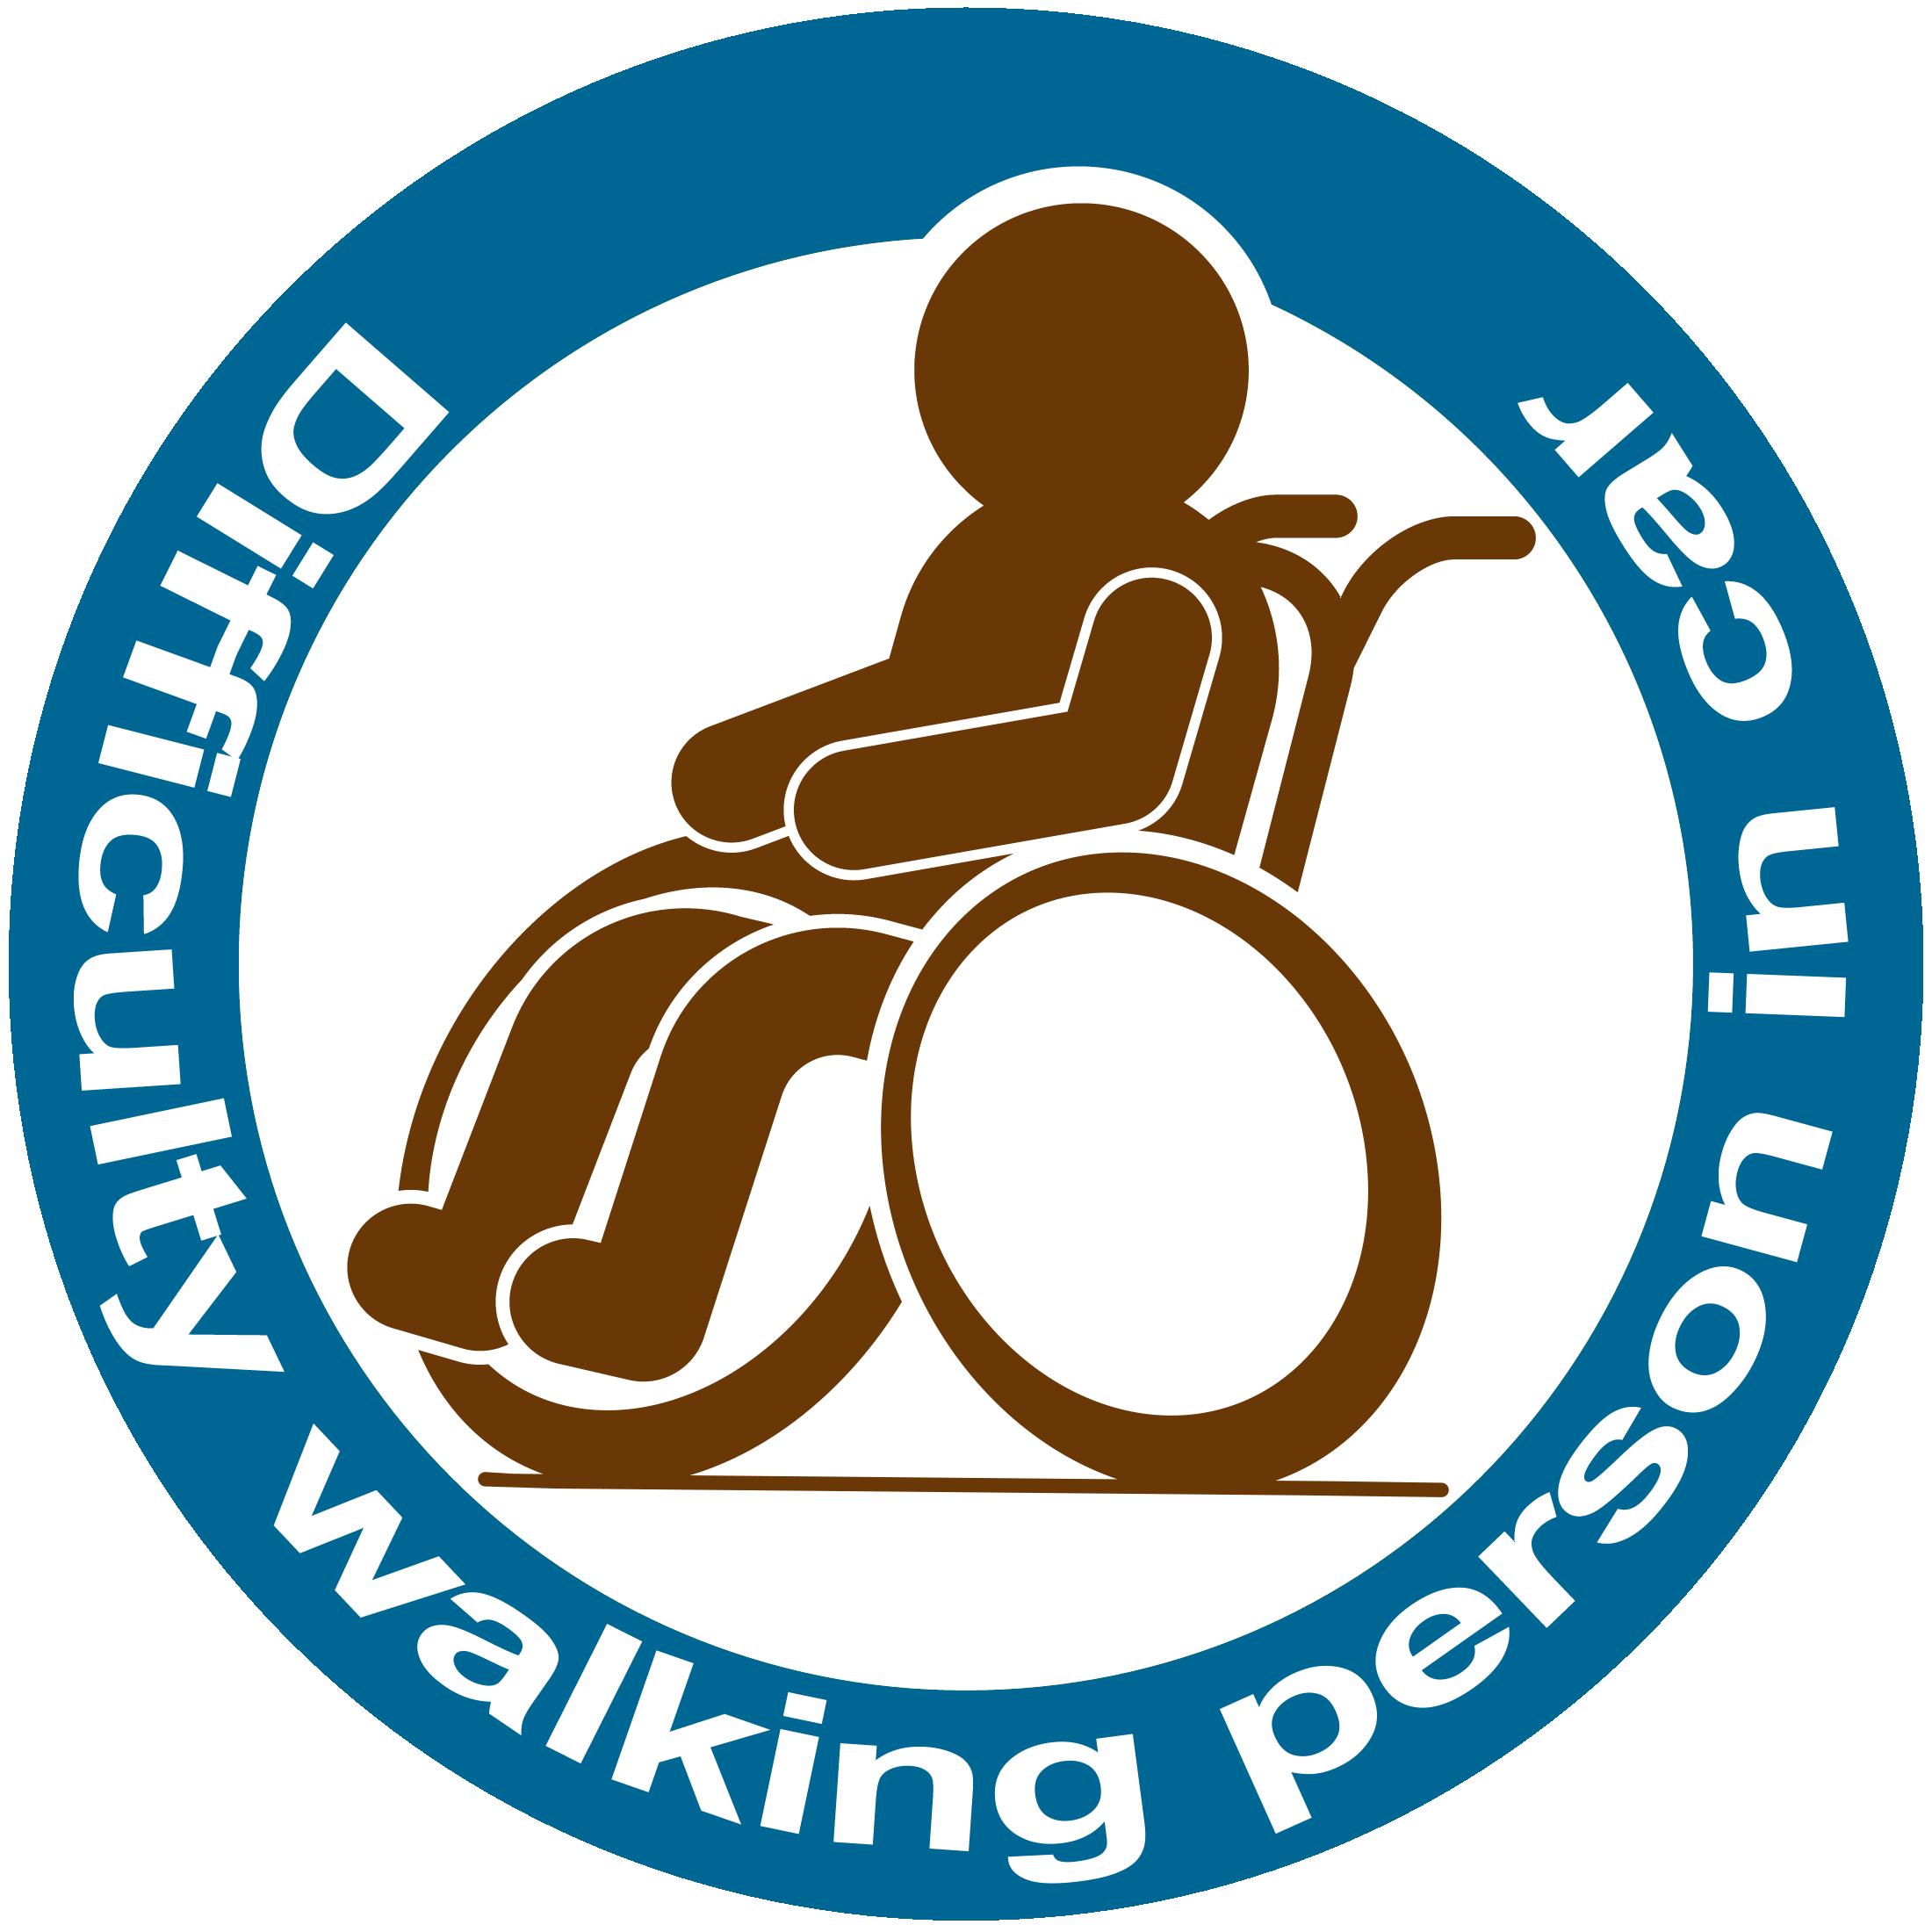 Difficulty walking parson in car ステッカー(青×茶)